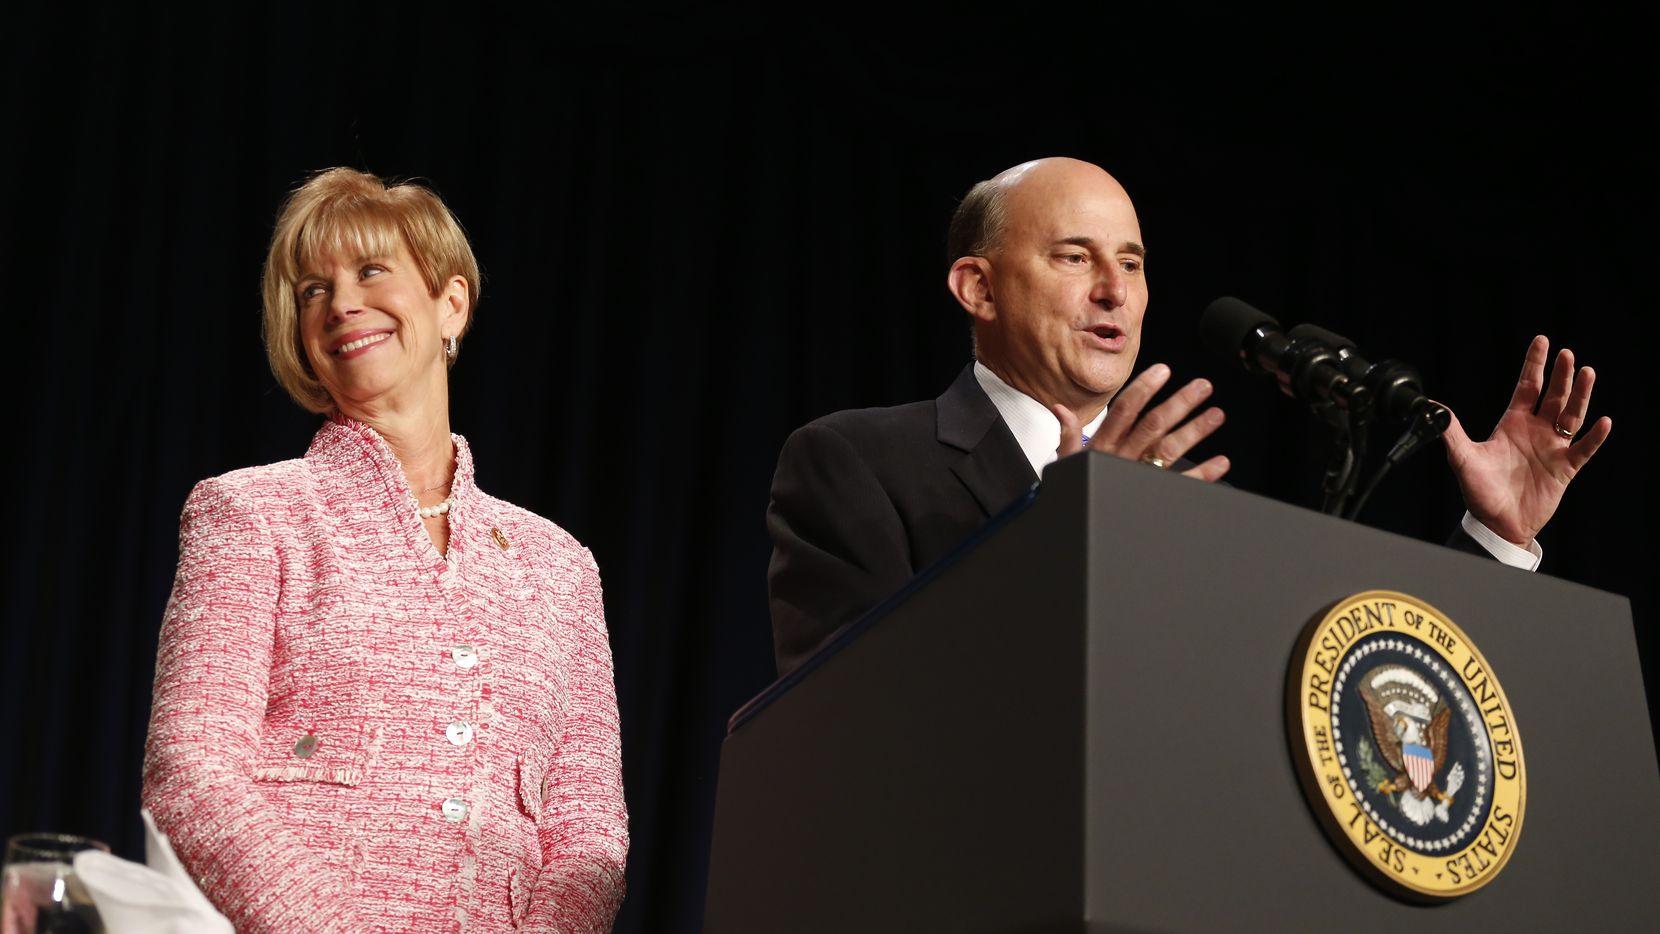 Rep. Louie Gohmert, R-Texas, and Rep. Janice Hahn, D-Calif., speak before President Barack Obama takes the podium at the National Prayer Breakfast in Washington, Thursday, Feb. 6, 2014. (AP Photo/Charles Dharapak)